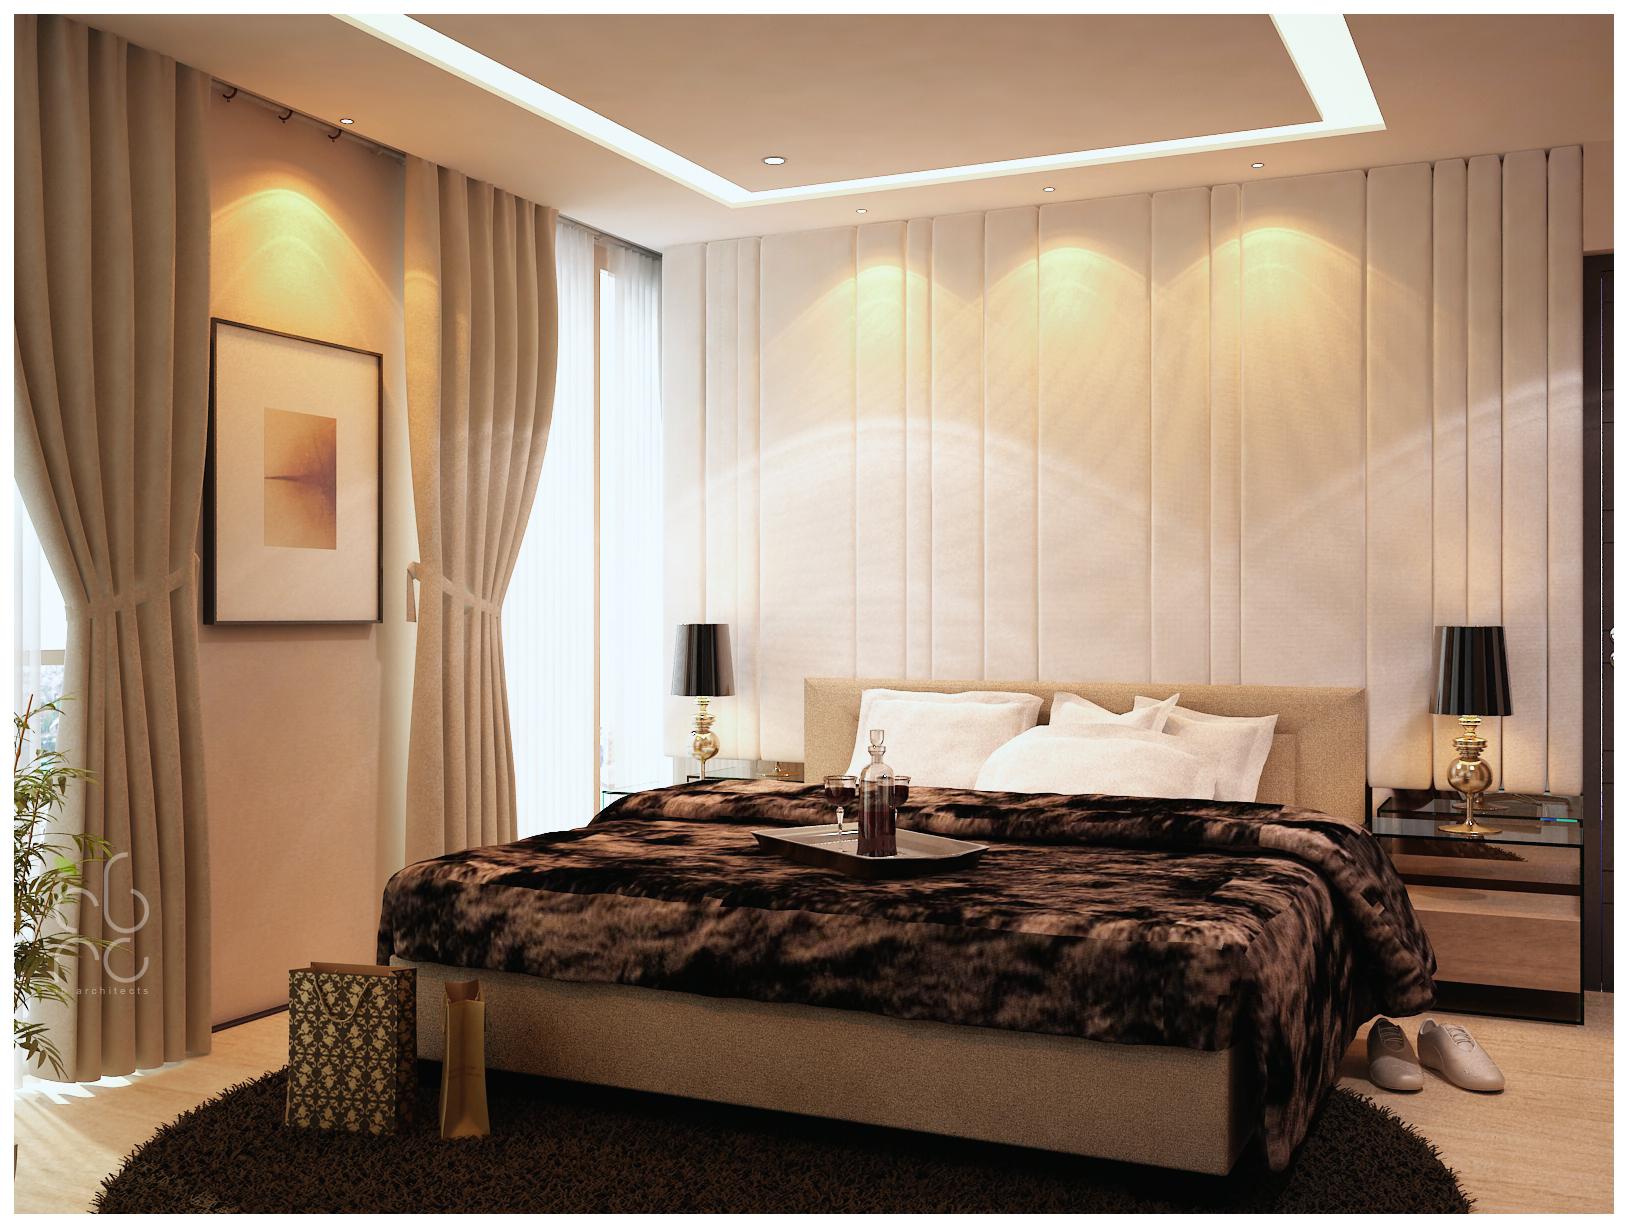 kamar tidur utama 2 by okamiammaterasu on deviantart